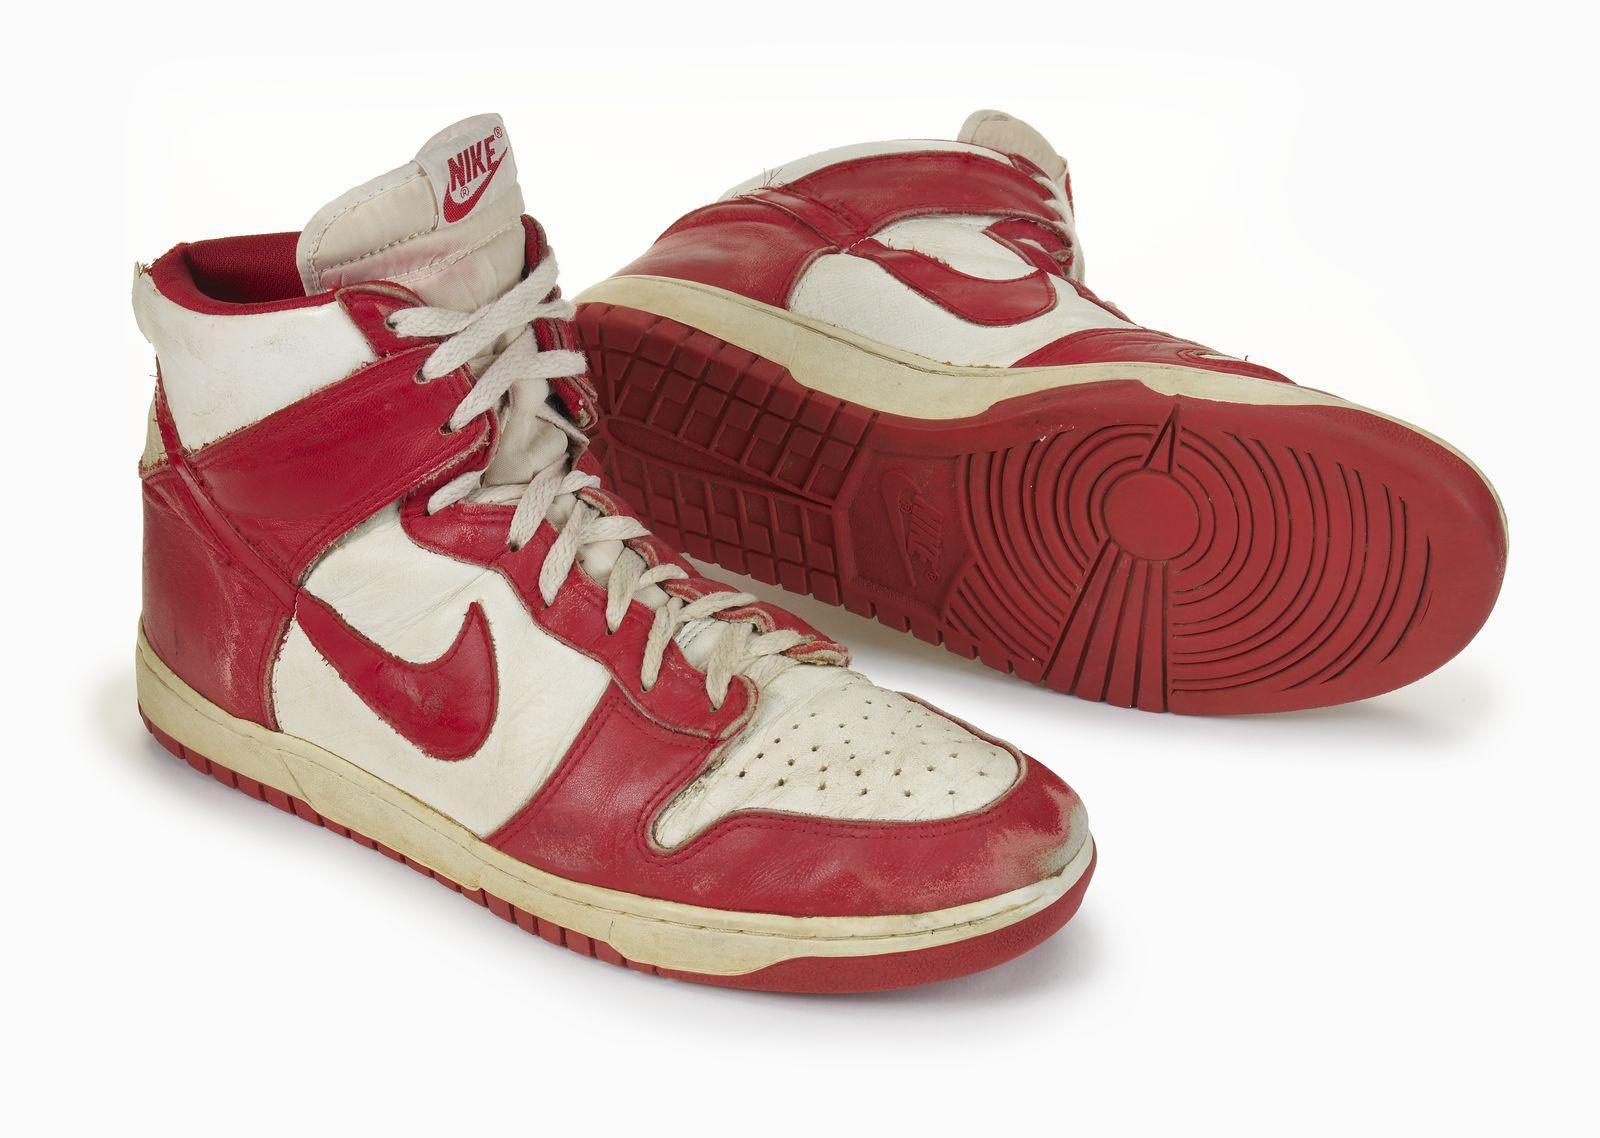 abd378aeefc5 Nike Dunk High Retro - Be True to Your School - size  blog